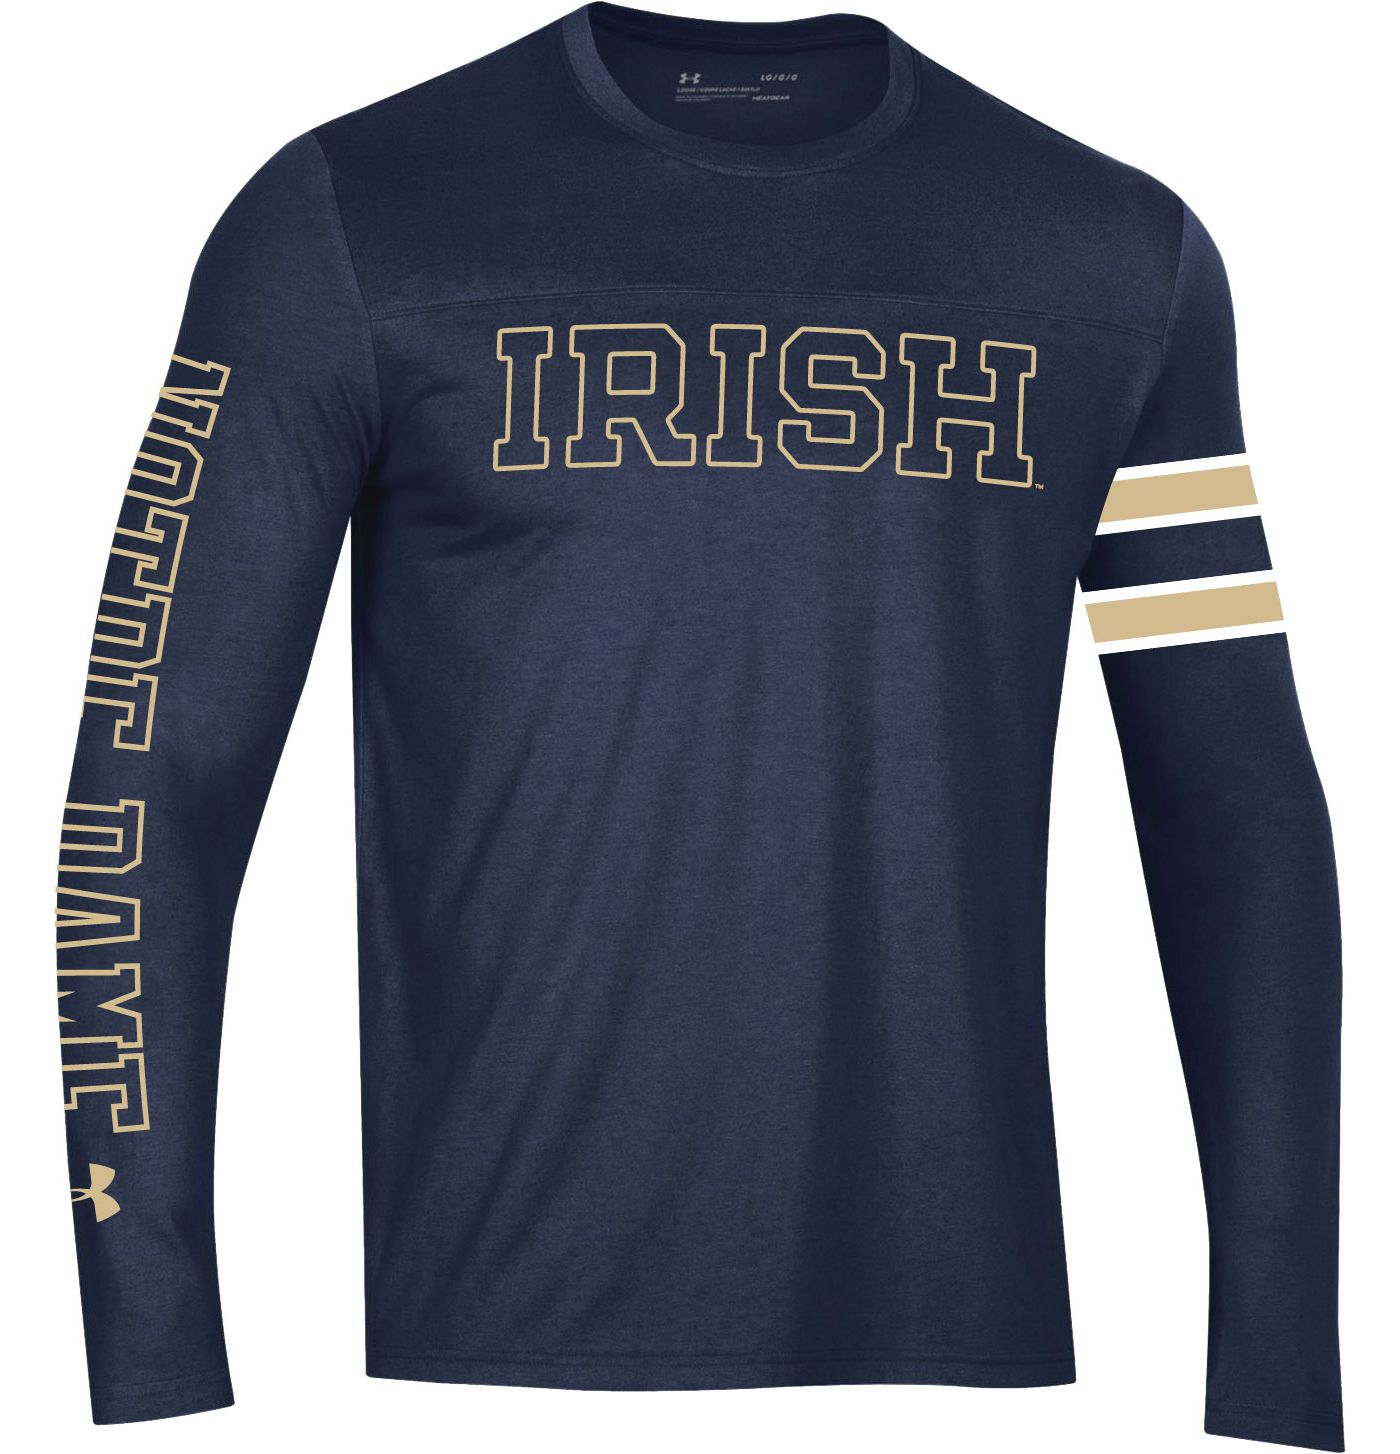 Under Armour Men's Notre Dame Fighting Irish Navy Performance Cotton Long Sleeve T-Shirt